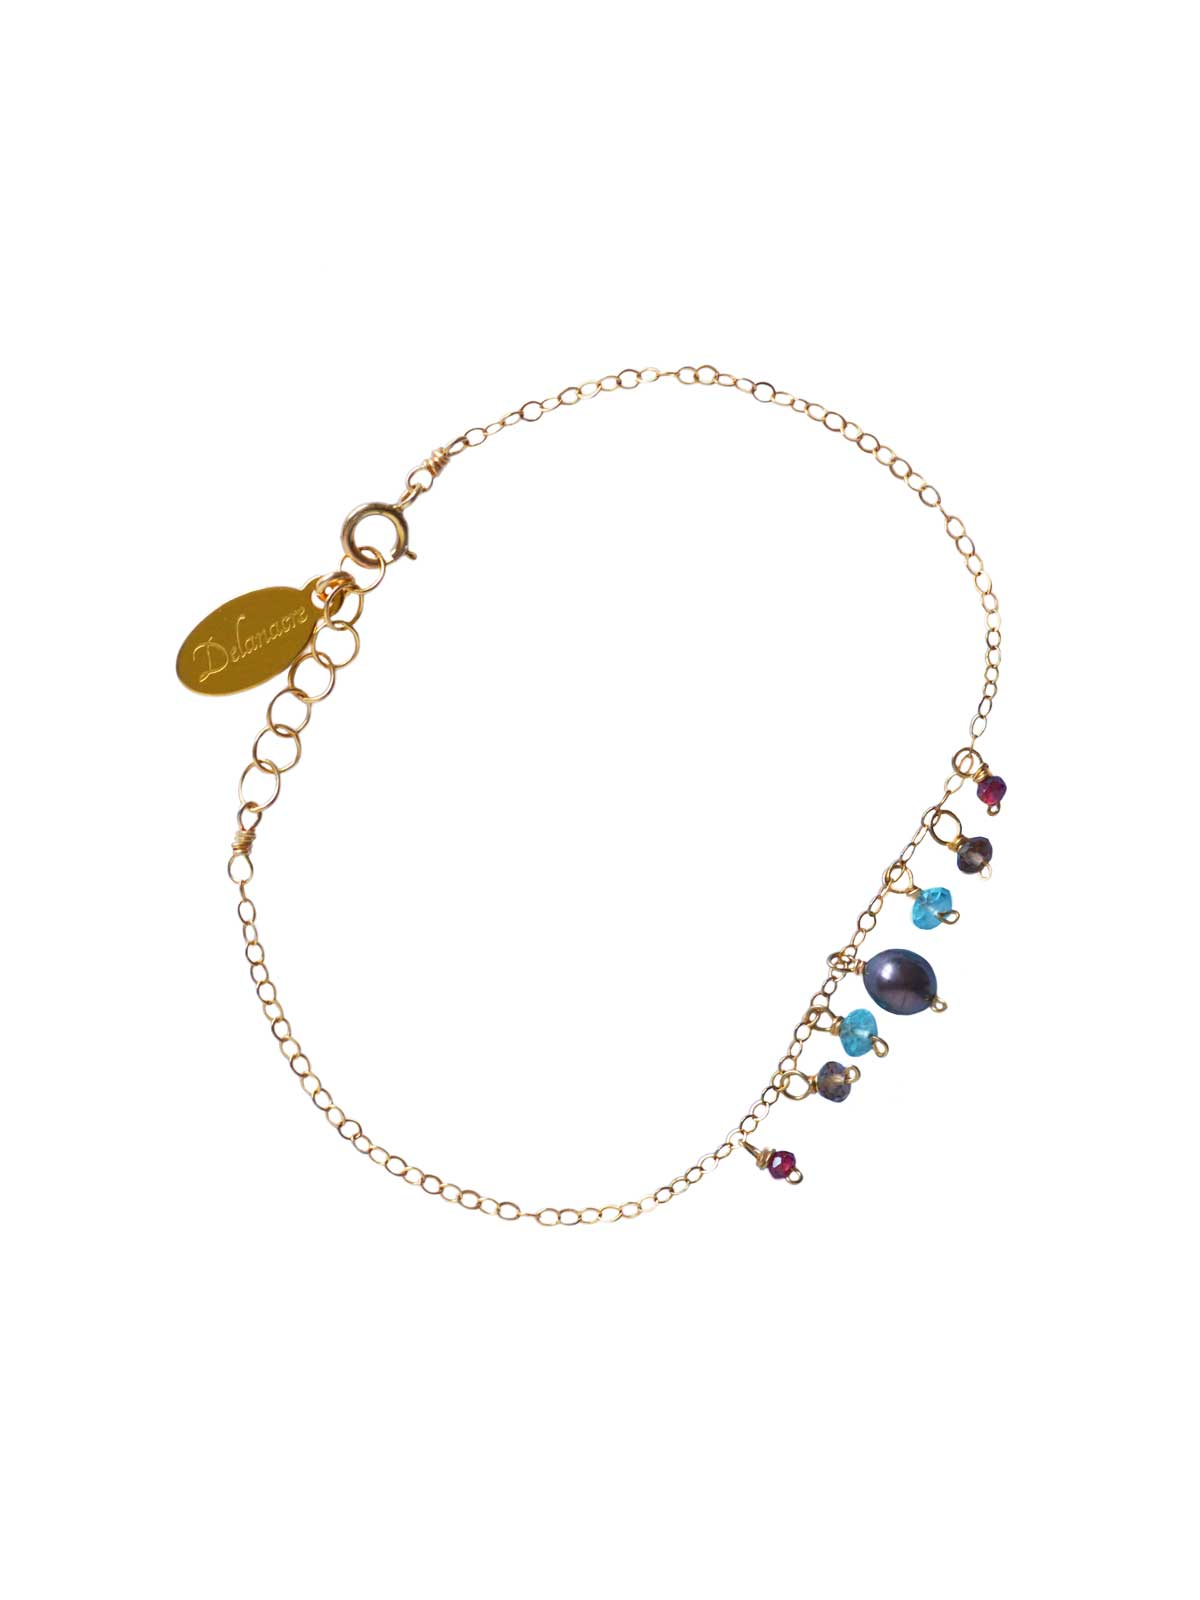 Bracelet Gold-filled 14 Karat Smoky Quartz Apatite Garnet gray Freshwater Pearl